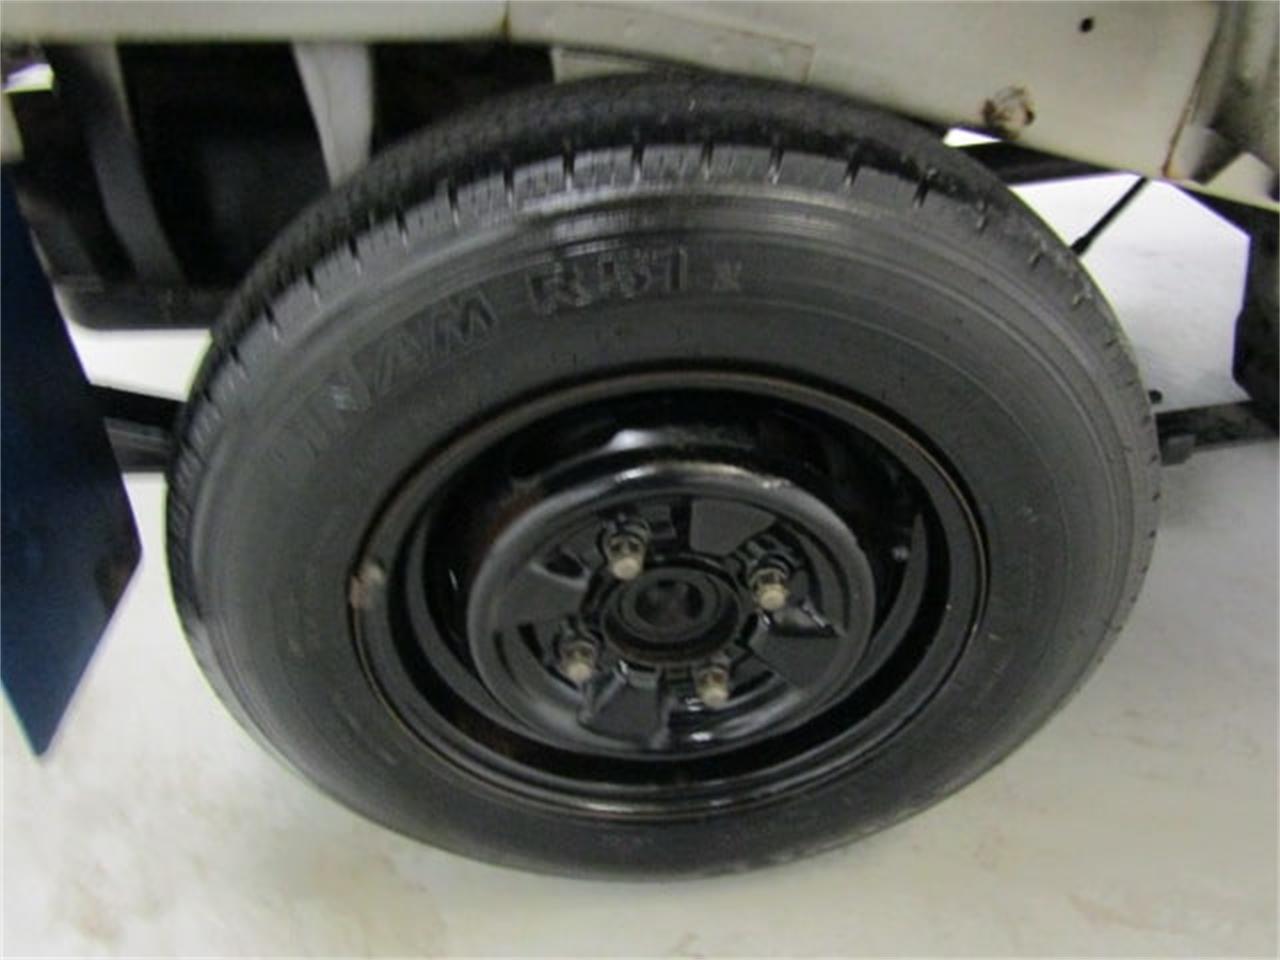 Large Picture of '90 Suzuki Carry located in Virginia - KOCF